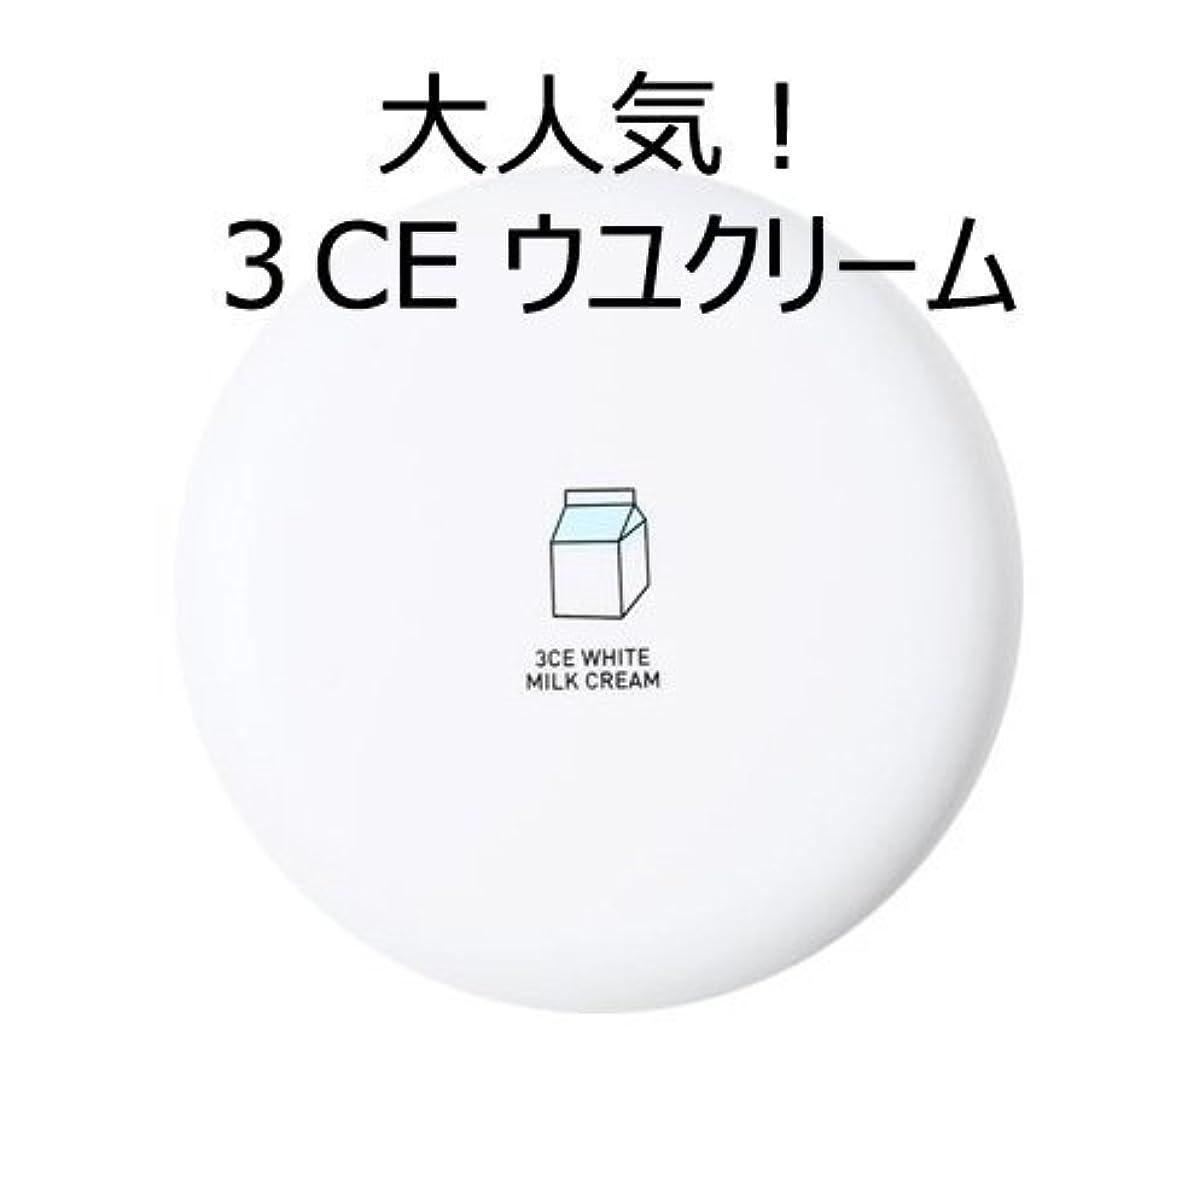 [3CE] [大人気!話題のウユクリーム] 3CE White Milk Cream [並行輸入品]